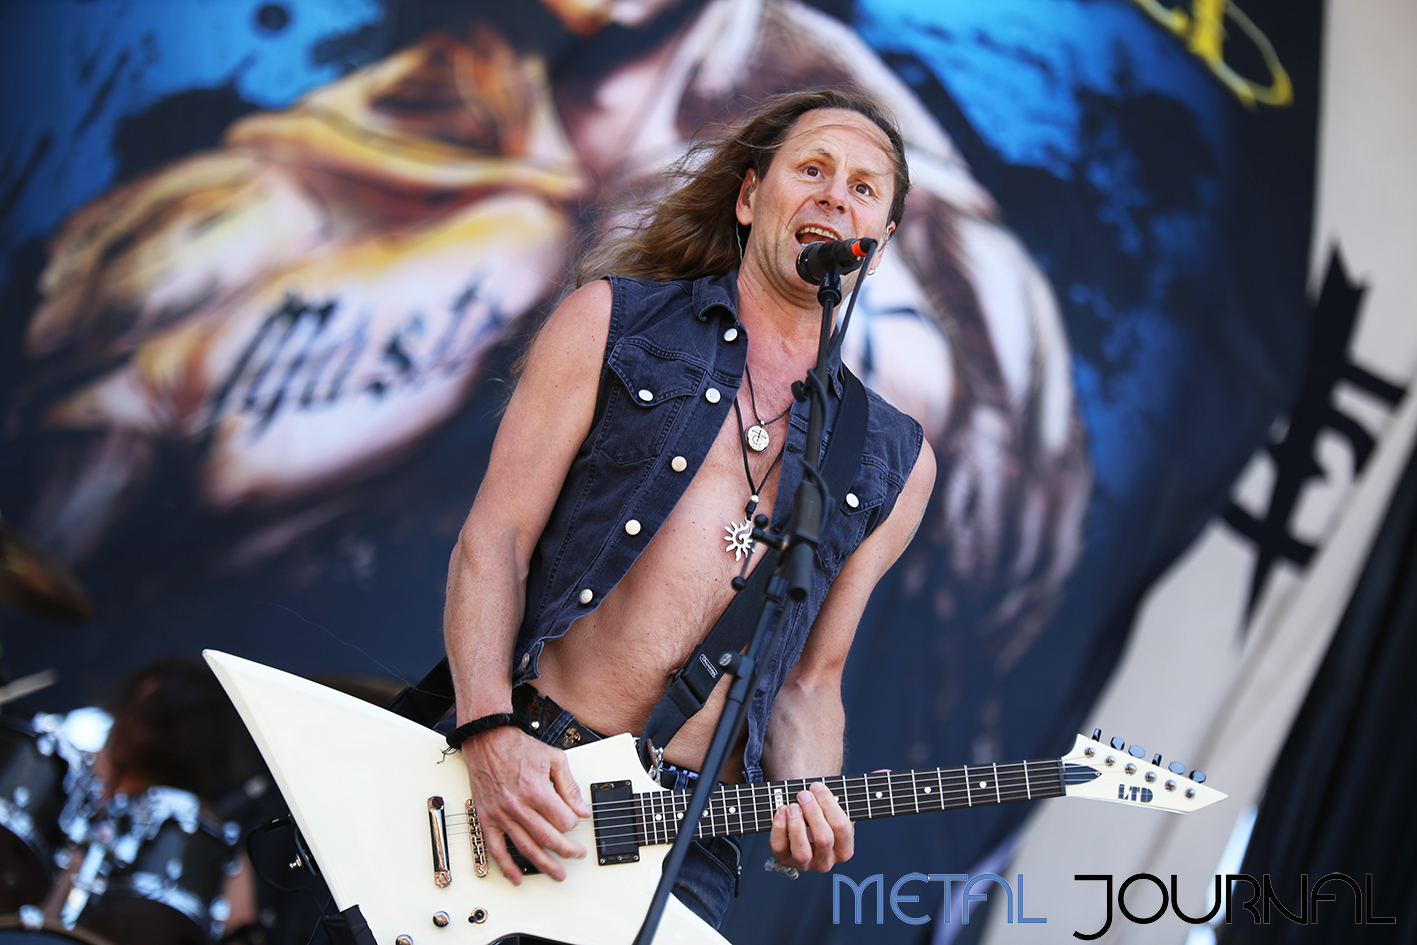 freedom call metal journal rock the coast 2019 pic 1